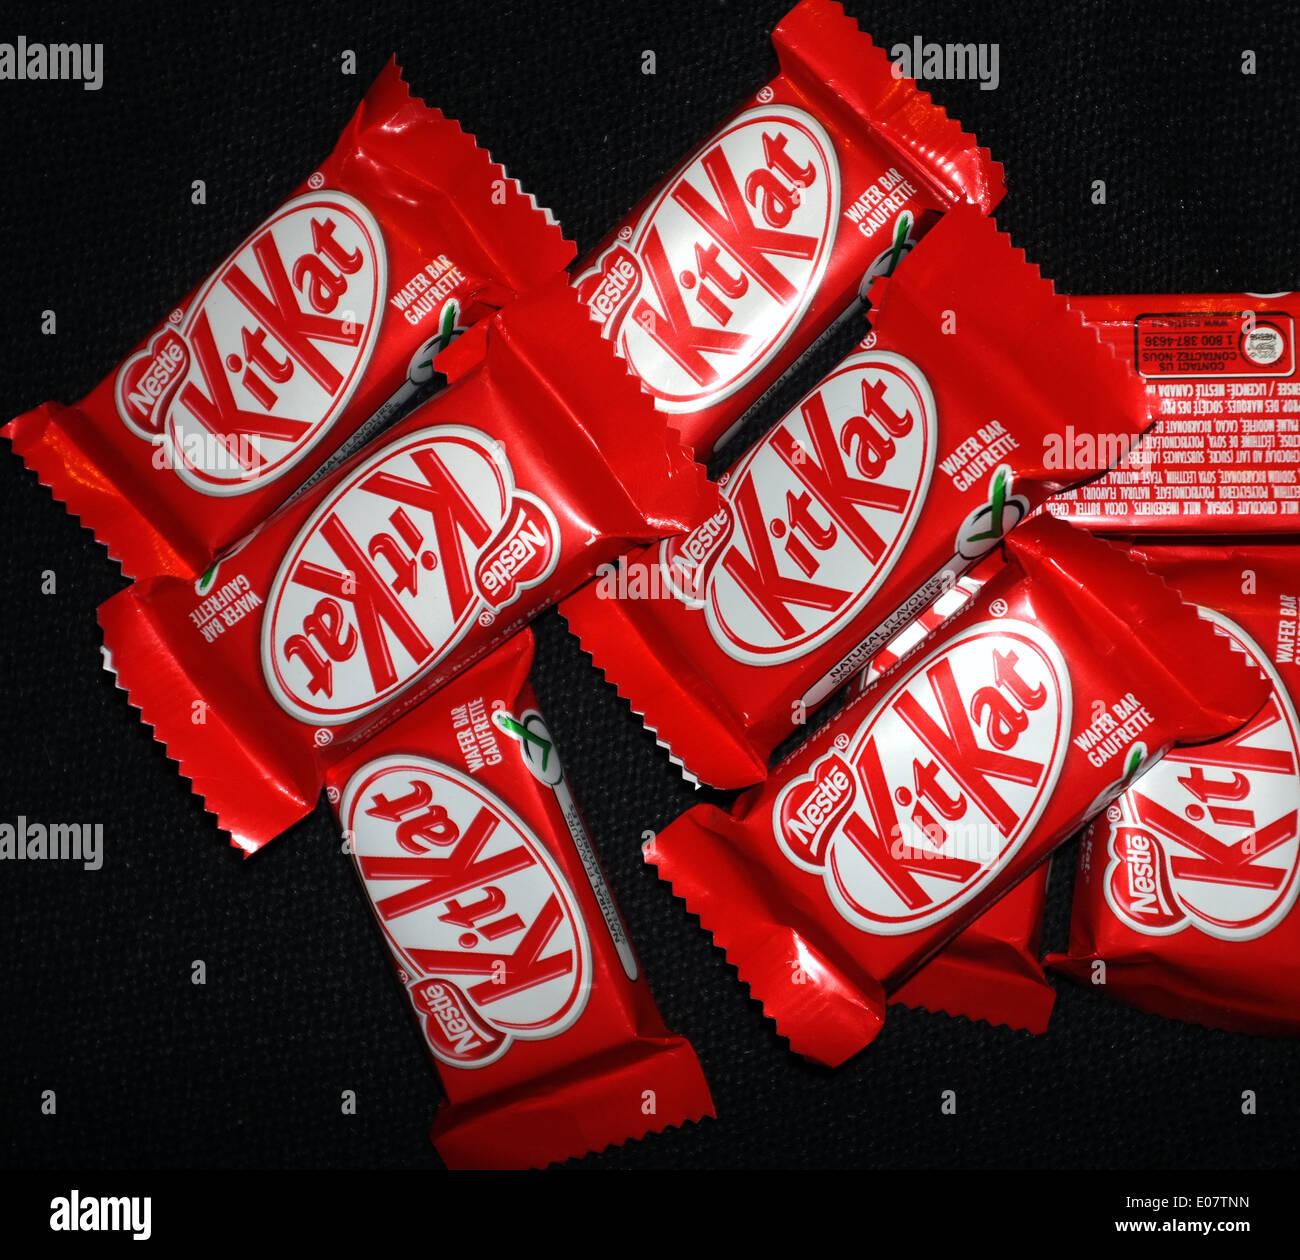 Kit Kat chocolates photographed against a black background. - Stock Image